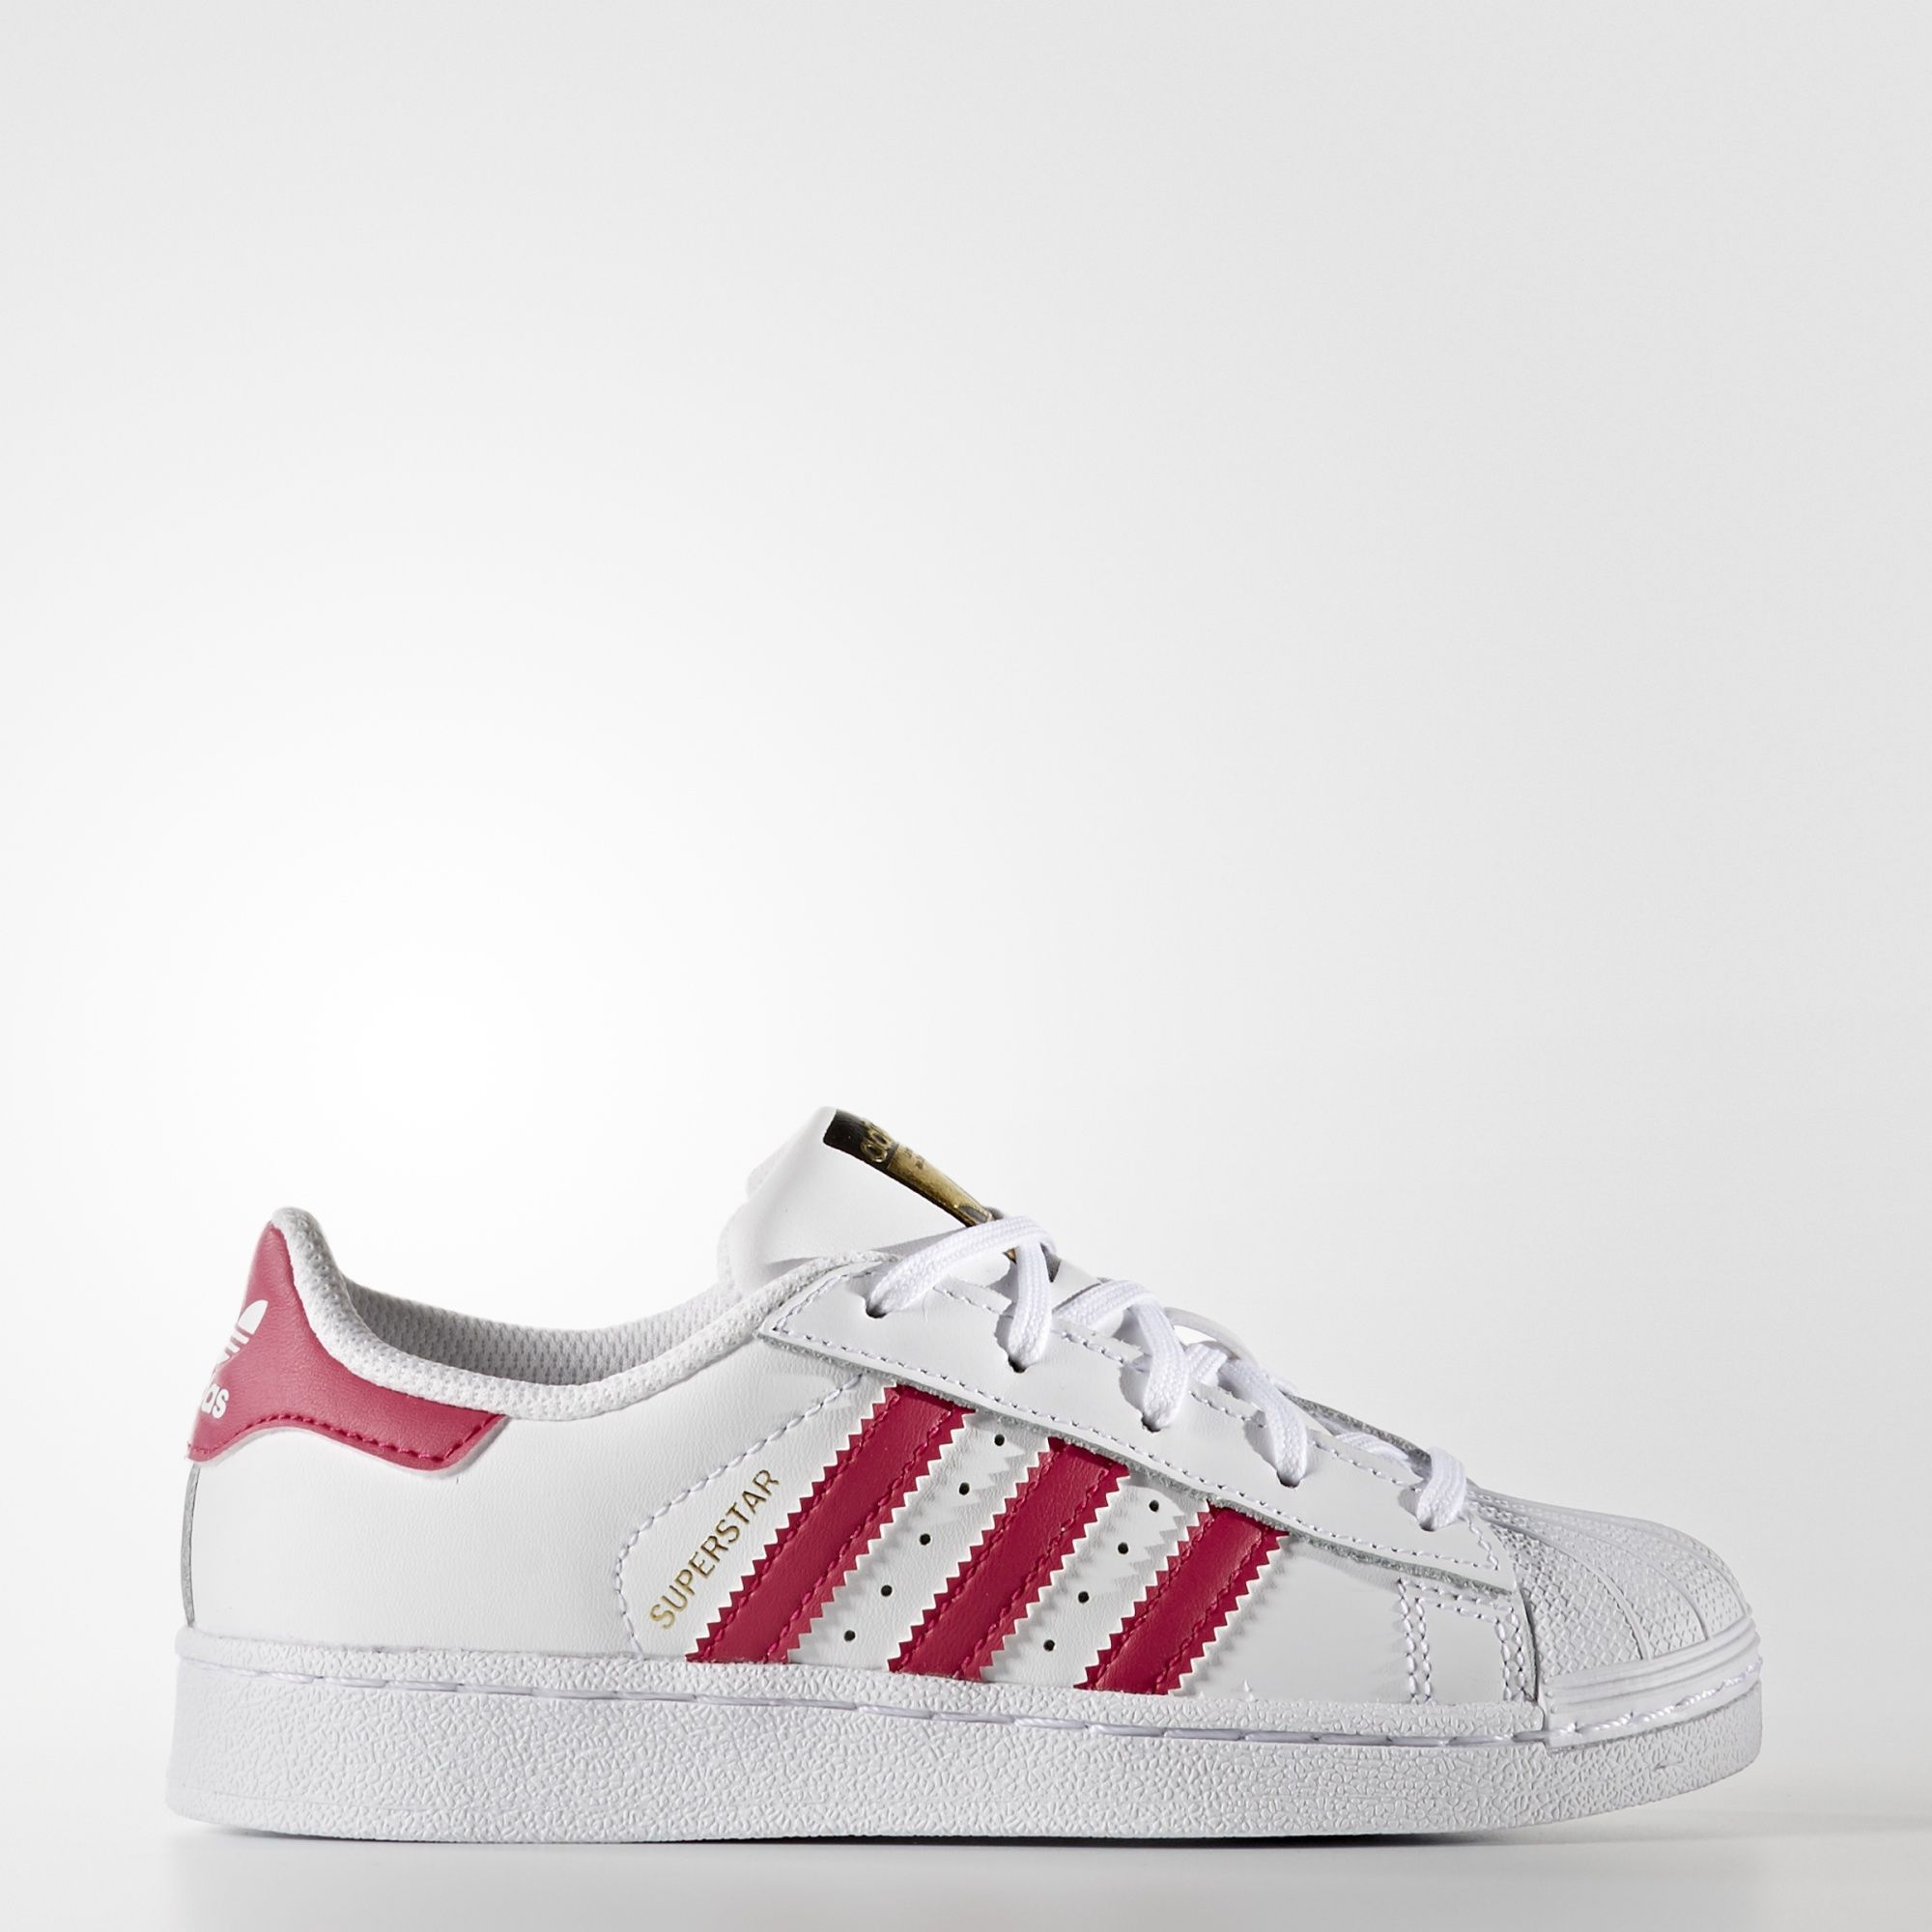 adidas - Tenis Originals Superstar Foundation. Sneakers AdidasAdidas MenNike  ...